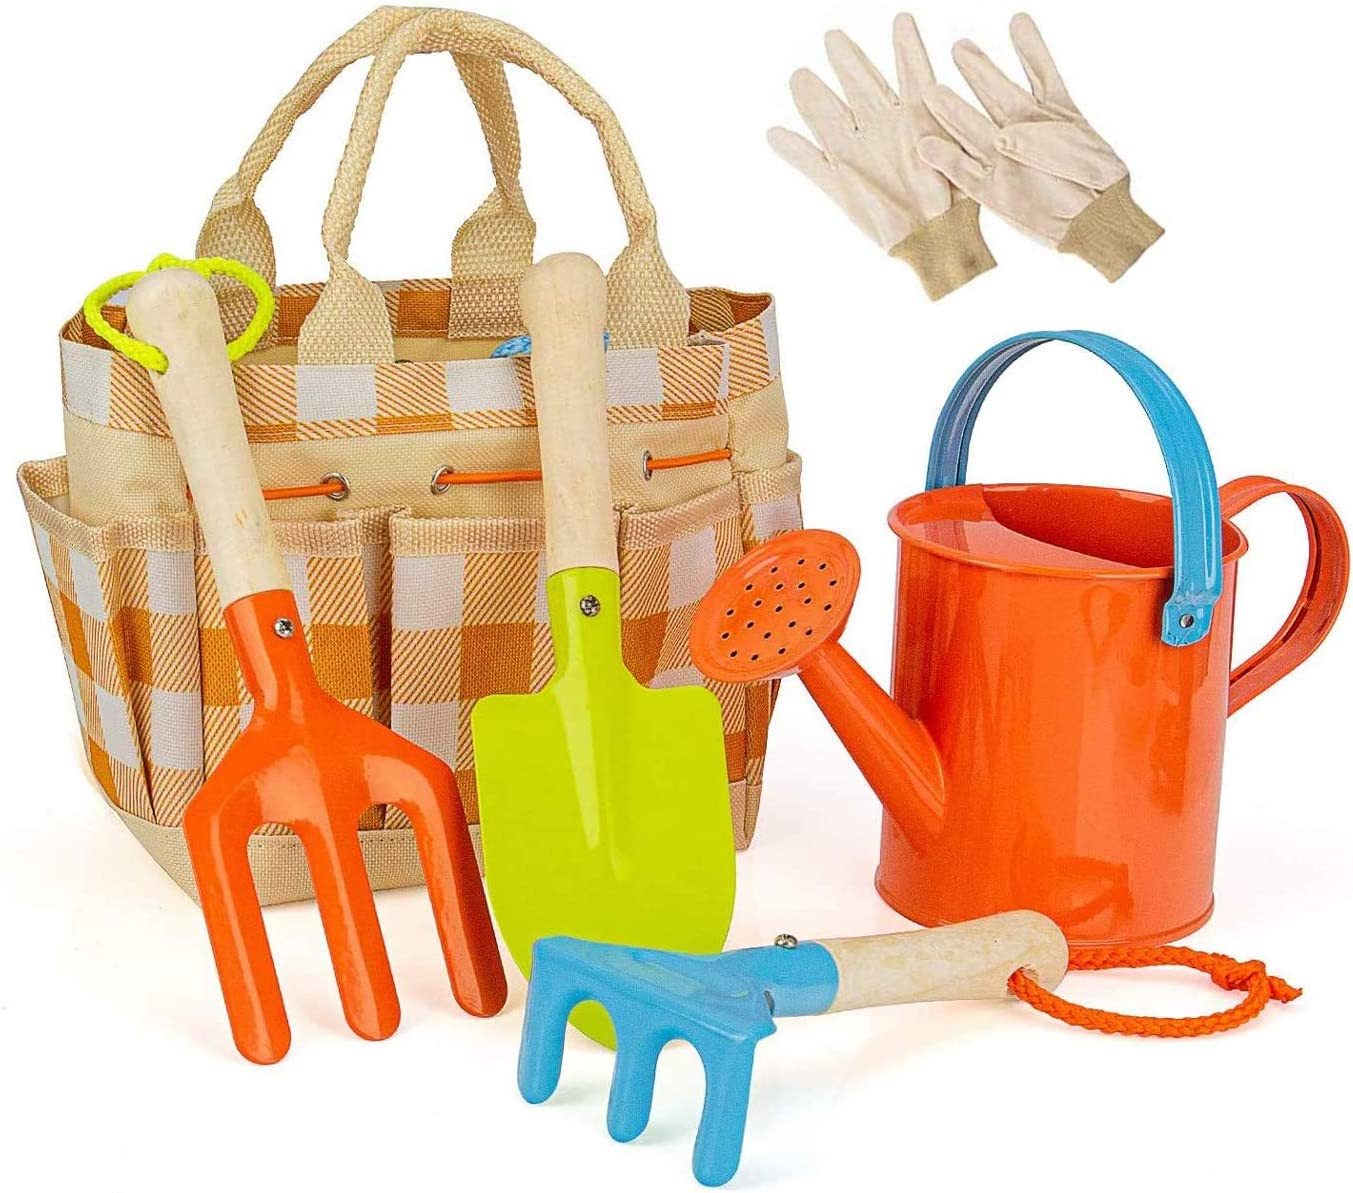 Little Gardener Tool Set with Garden for Kids Tools Gardenin Bag 2021 autumn and winter Regular store new